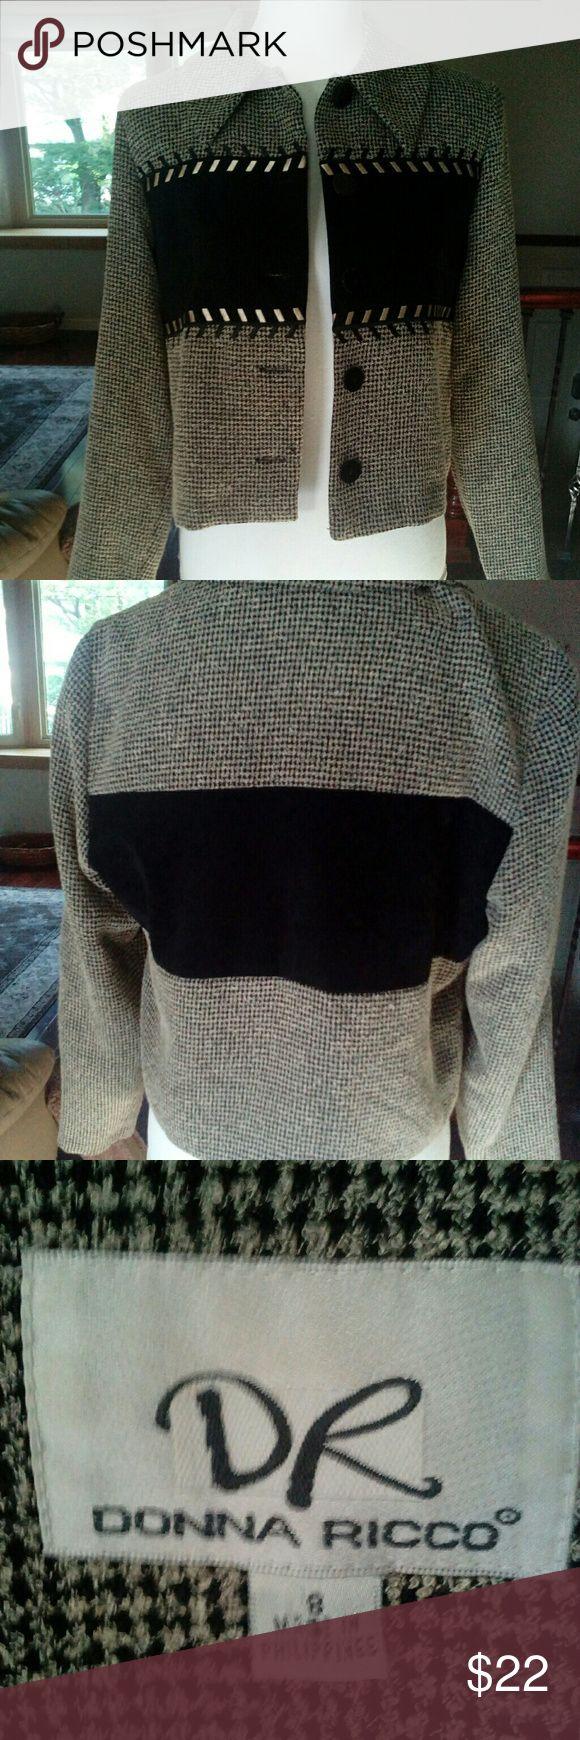 DONNA RICCO BLAZER Flawless condition. Gold detailing. Zero odors. Donna Ricco Jackets & Coats Blazers